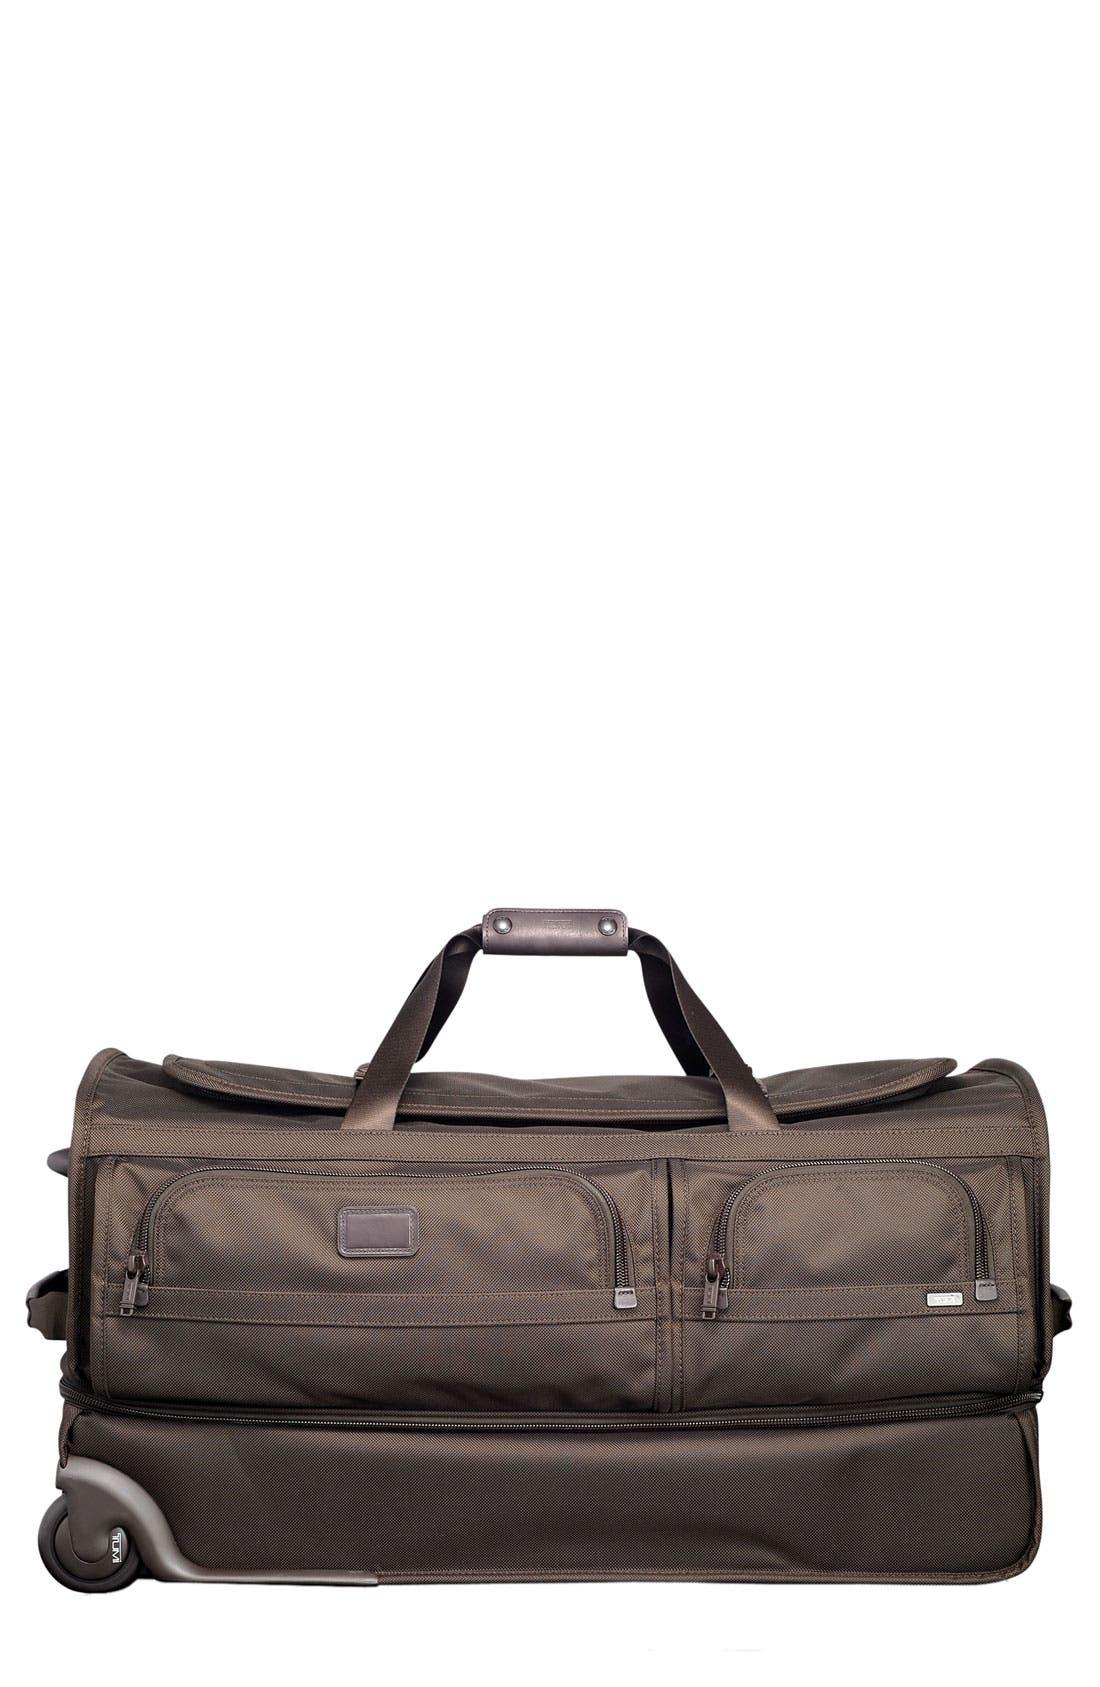 Main Image - Tumi 'Alpha - Large' Wheeled Split Duffel Bag